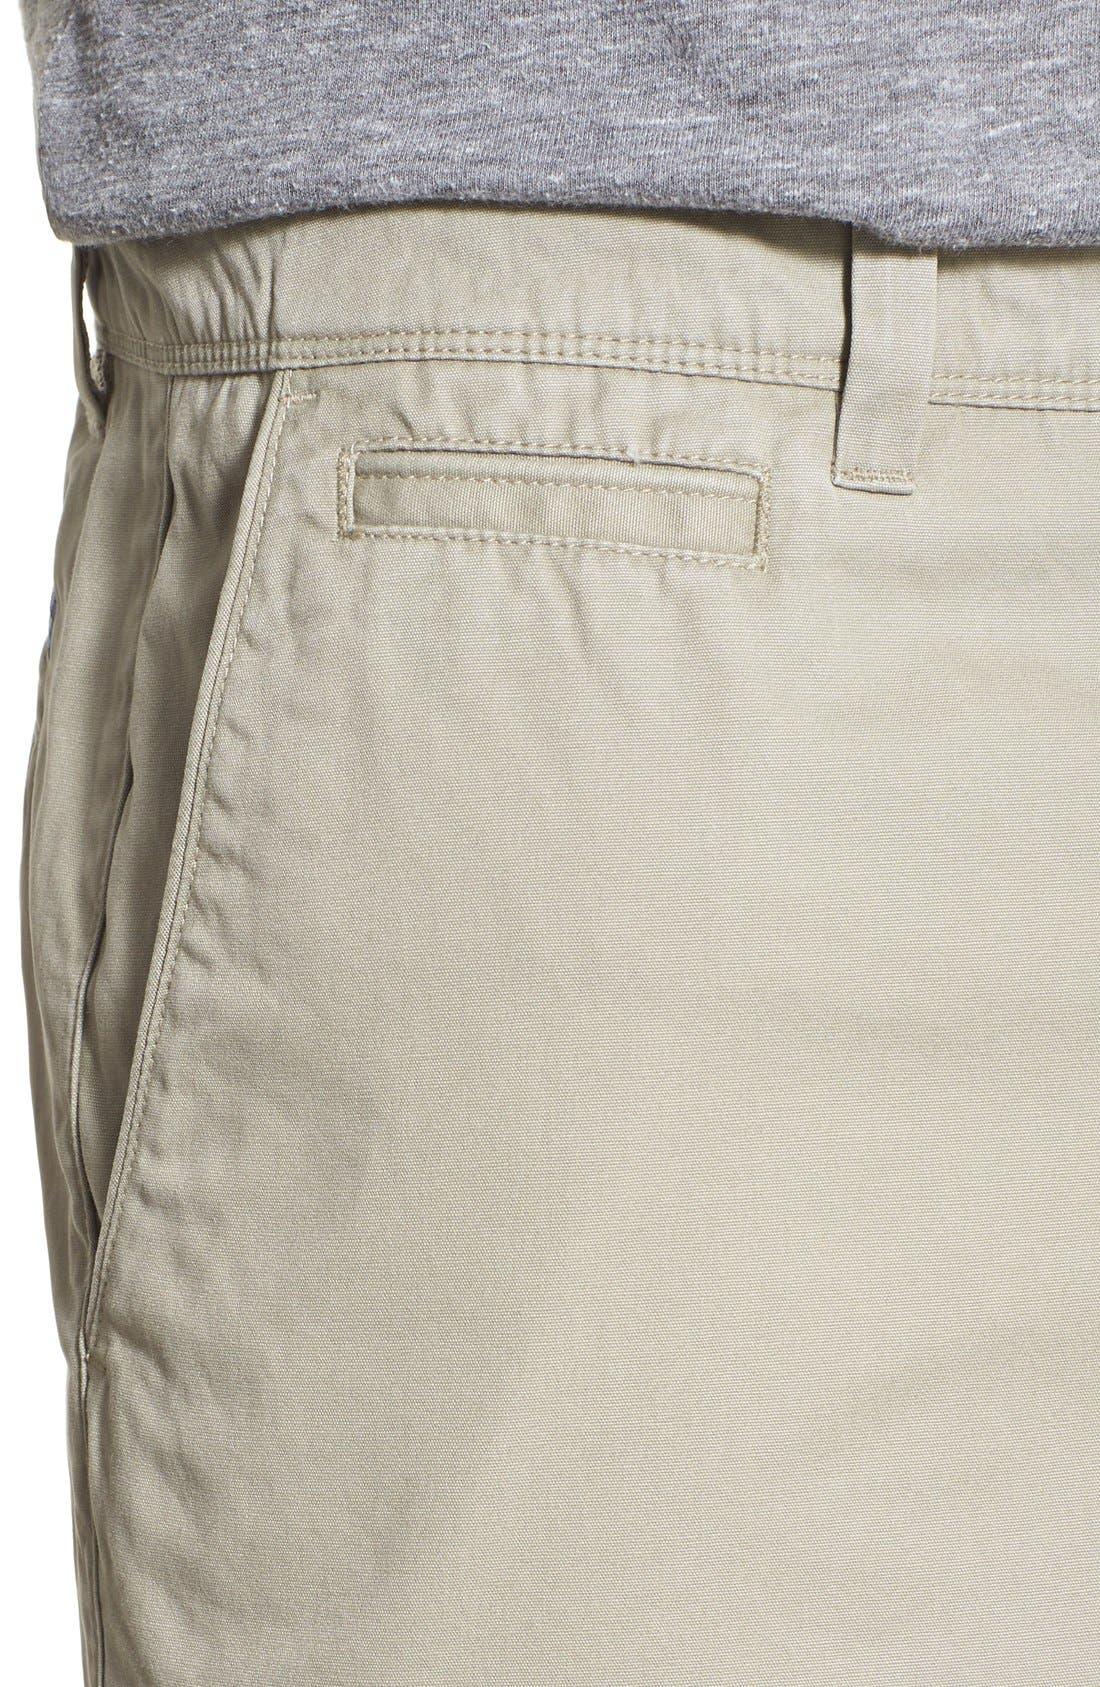 'Skipper' Shorts,                             Alternate thumbnail 4, color,                             250